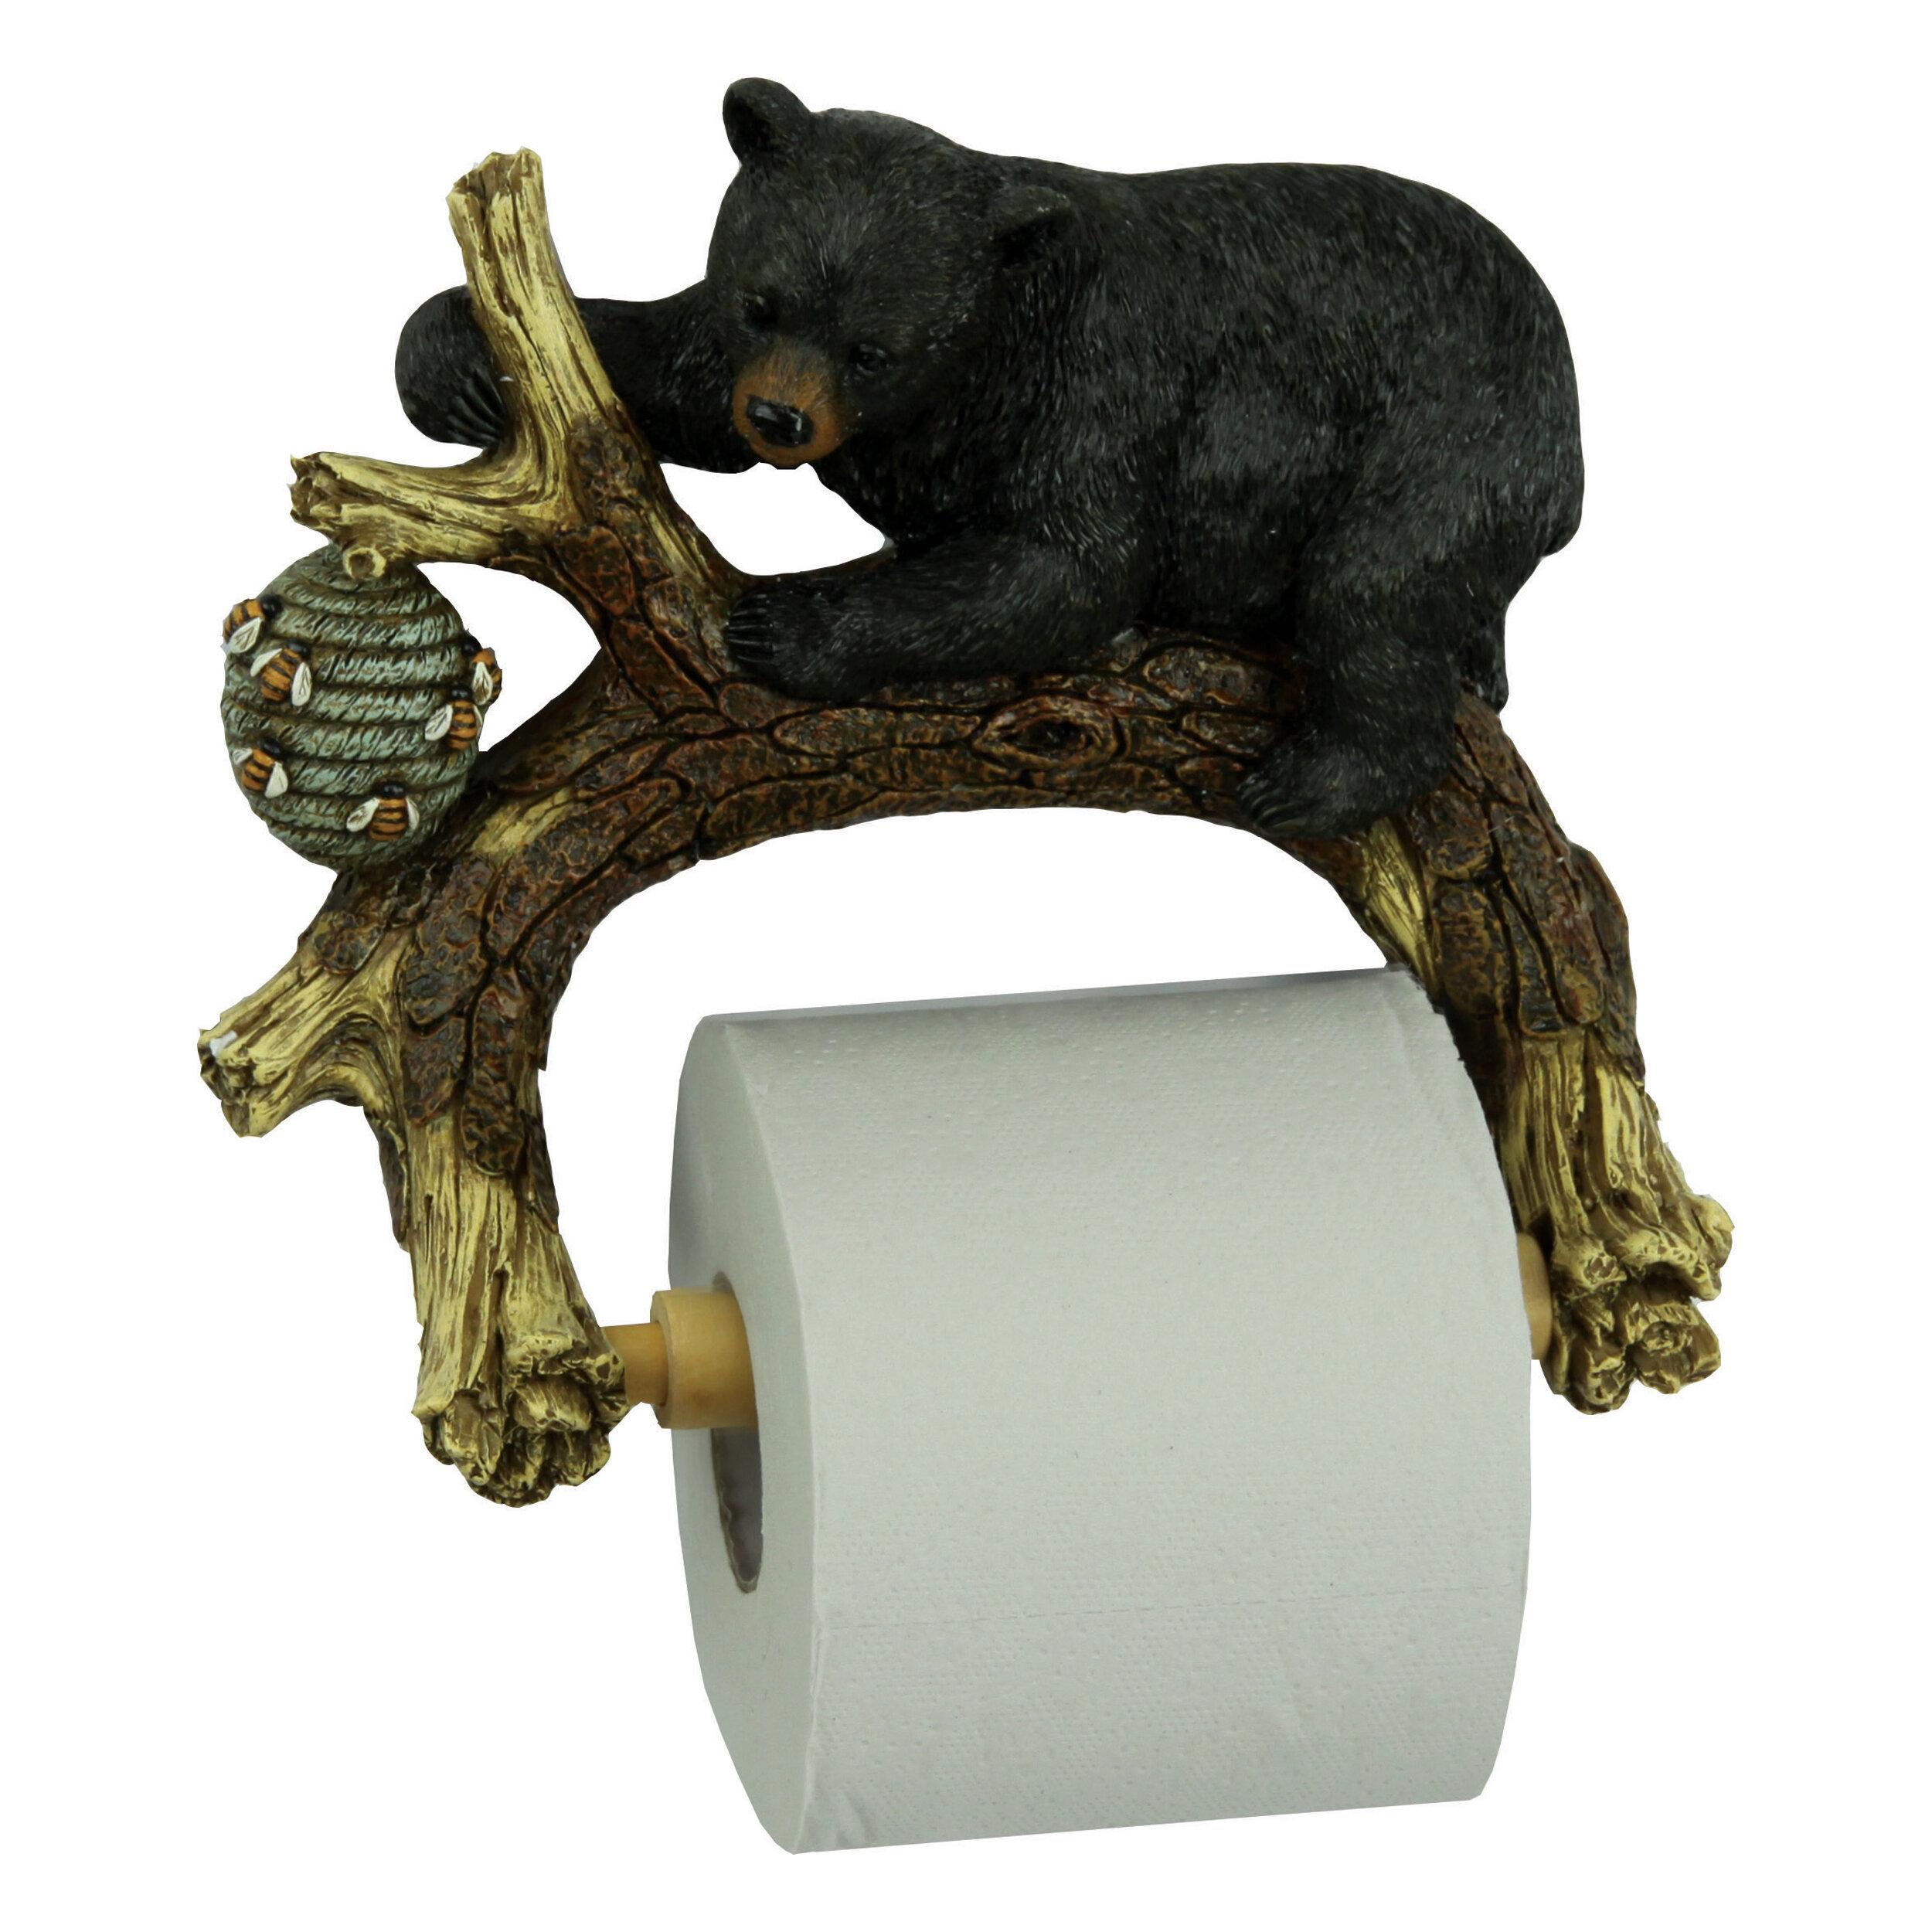 Bronze Rustic Toilet Paper Holders You Ll Love In 2021 Wayfair